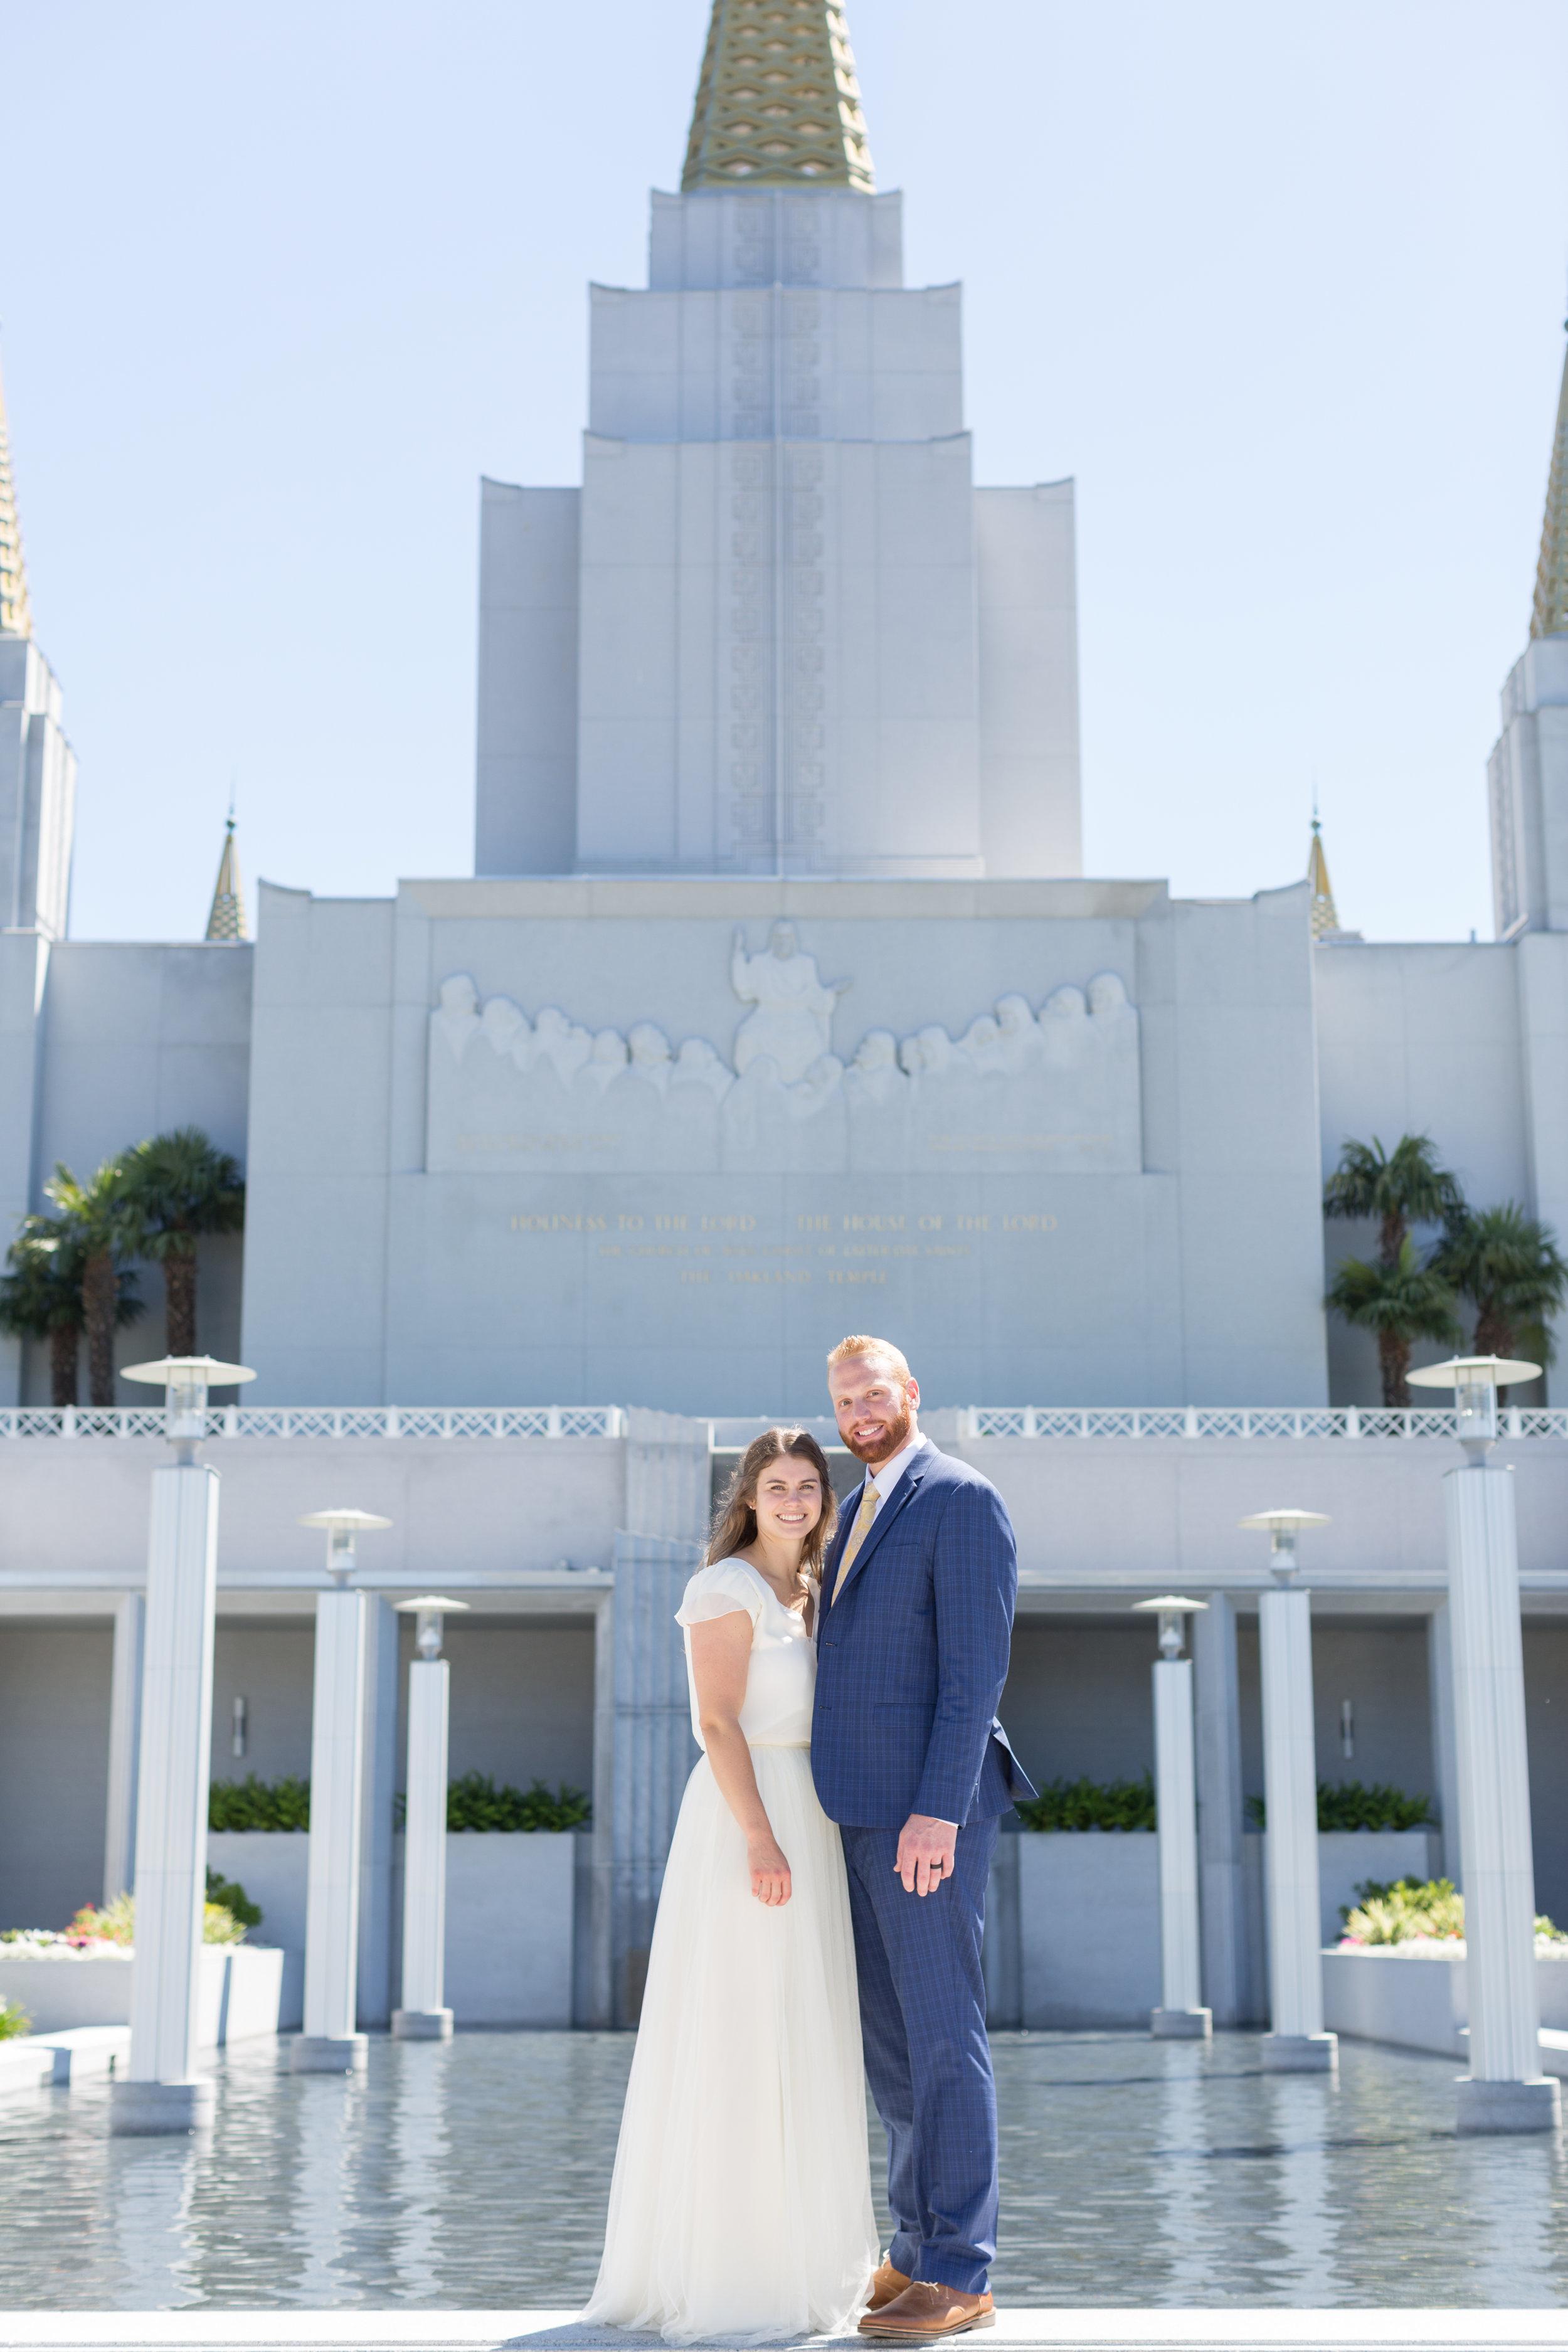 Oakland-Temple-Wedding-28.jpg